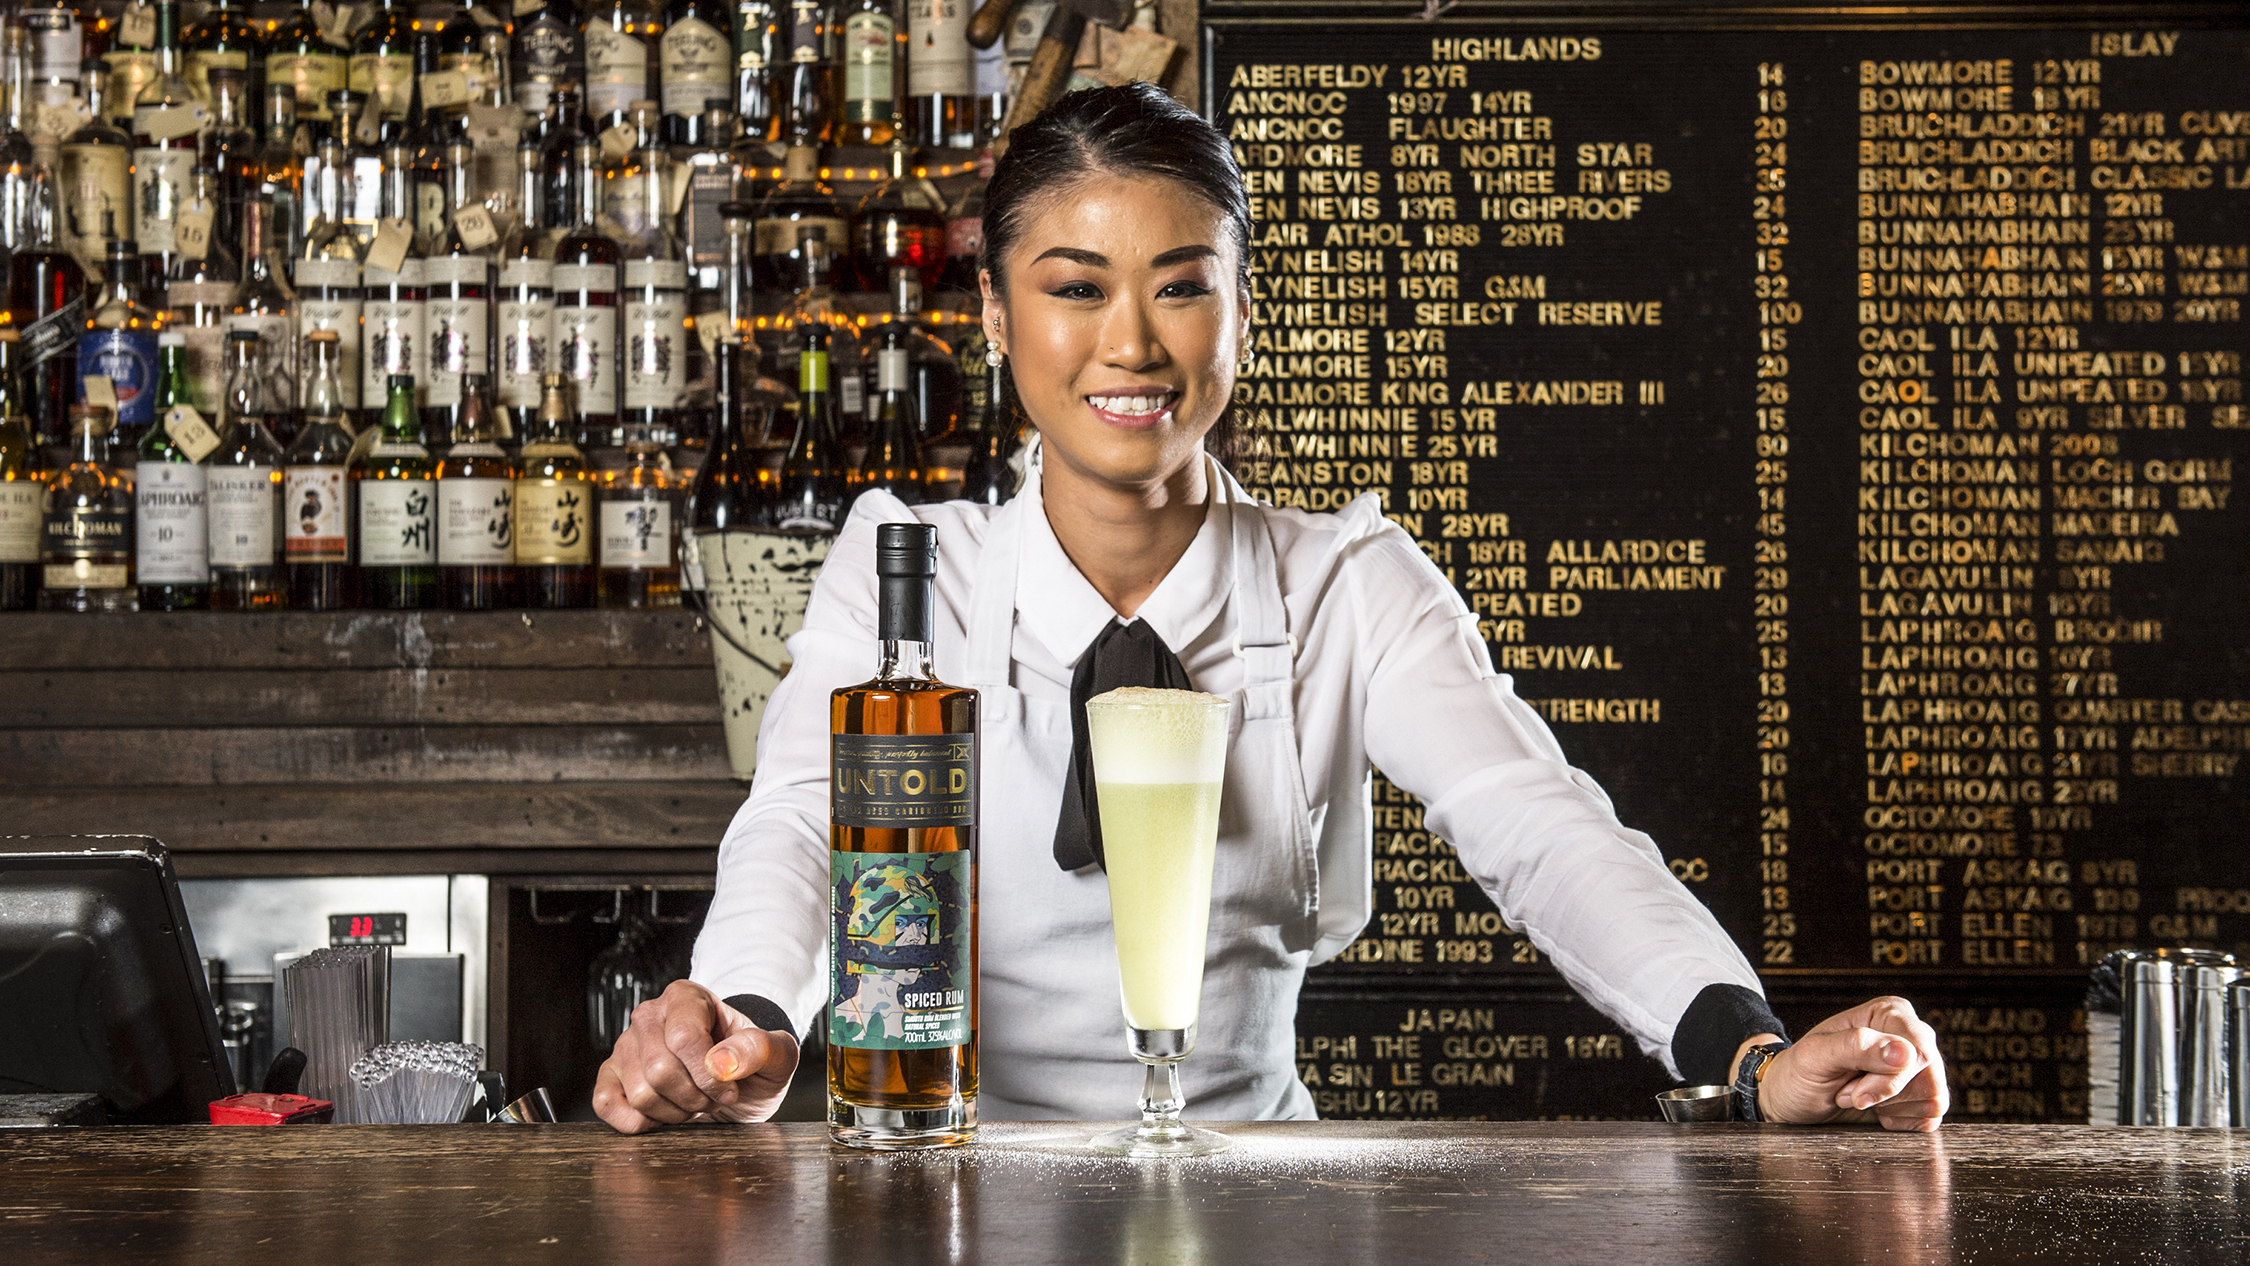 Commercial - Untold Rum - Priscilla Leong, The Baxter Inn